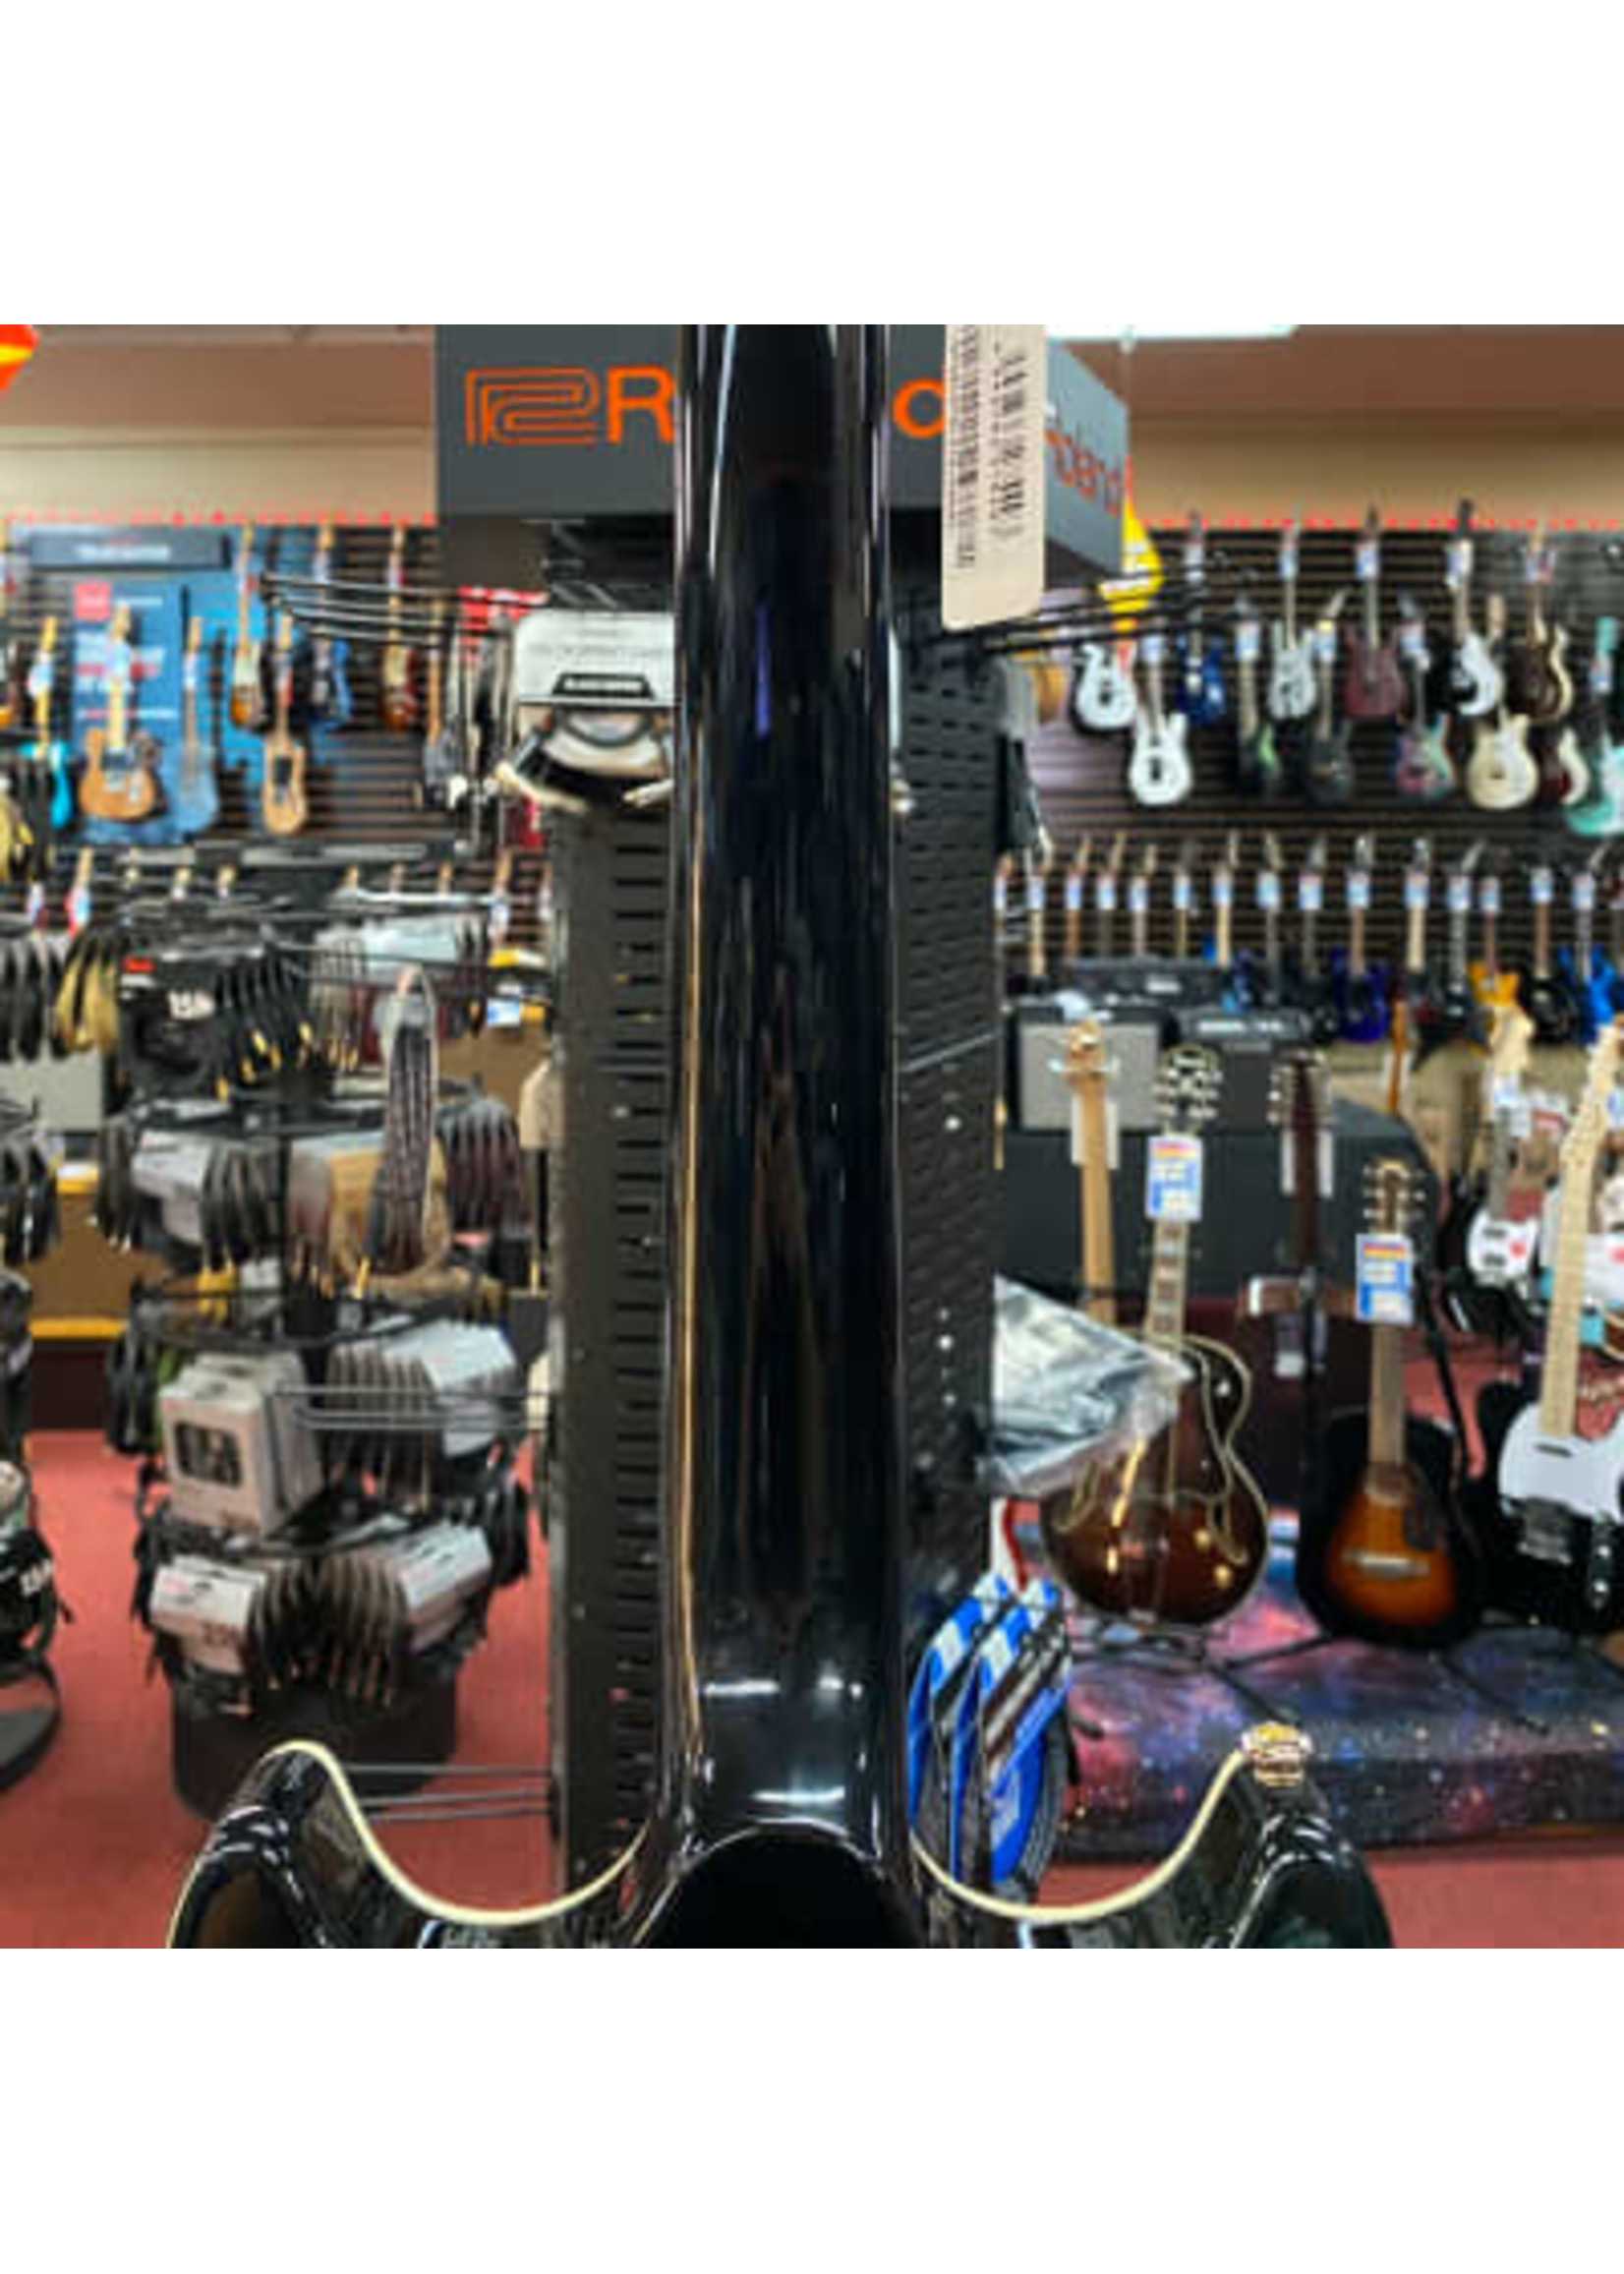 Ibanez Ibanez Standard AR520H Semi-hollowbody Electric Guitar - Black